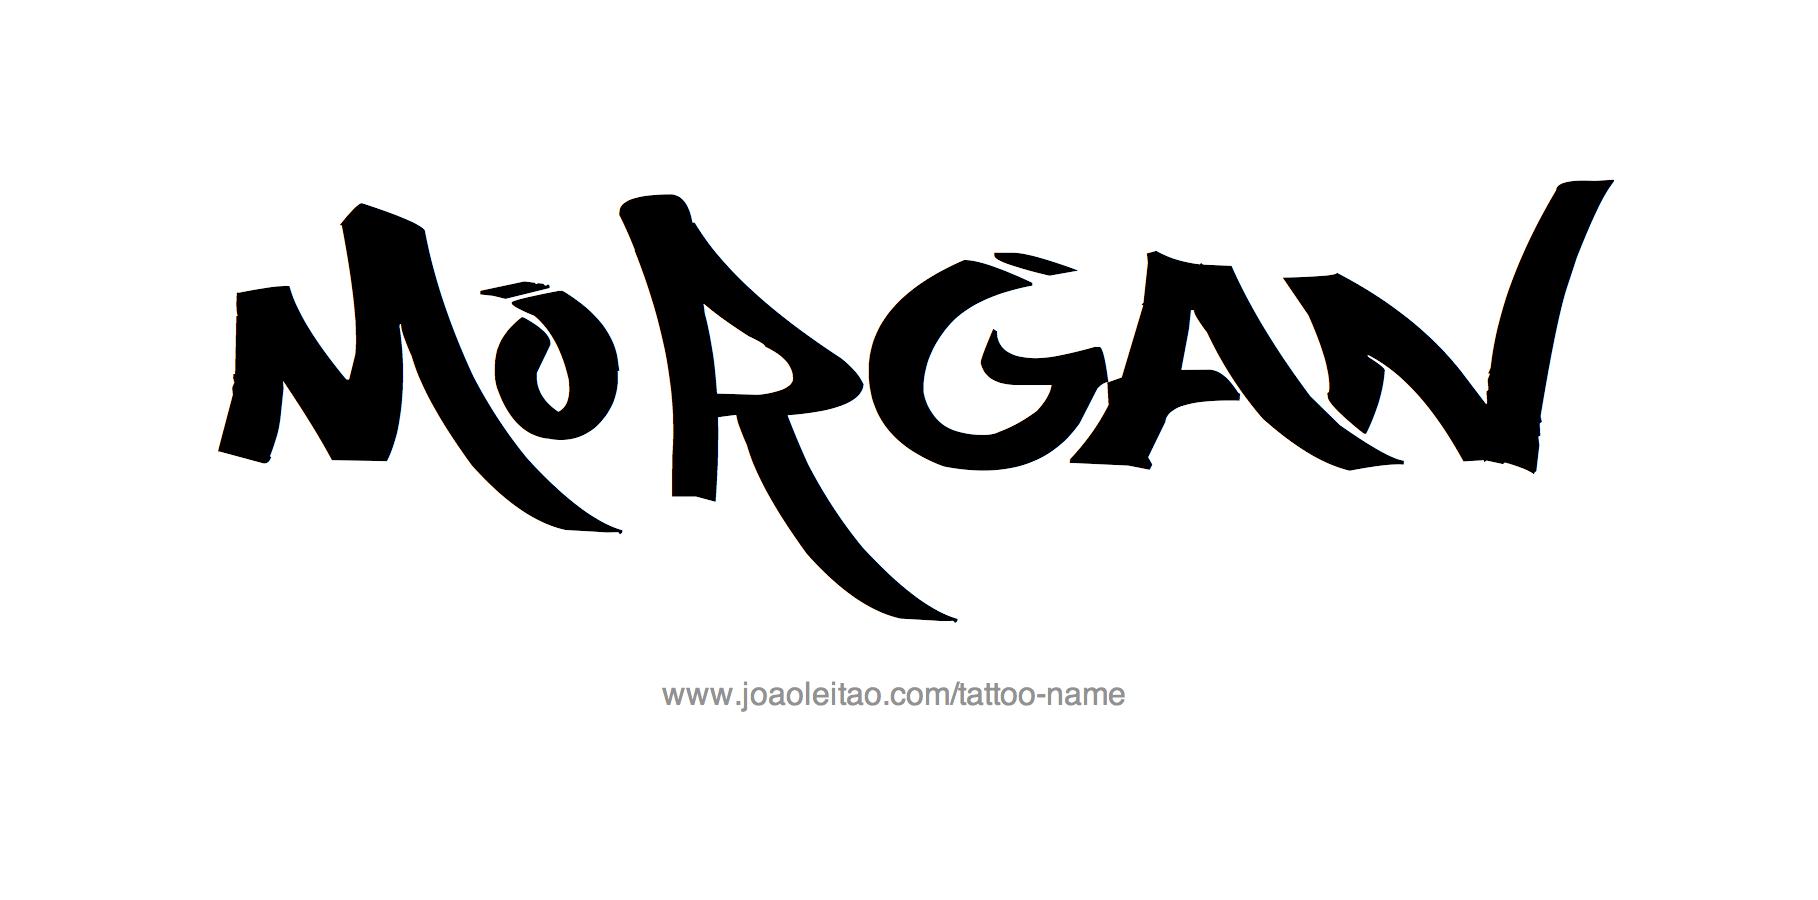 morgan name tattoo designs. Black Bedroom Furniture Sets. Home Design Ideas